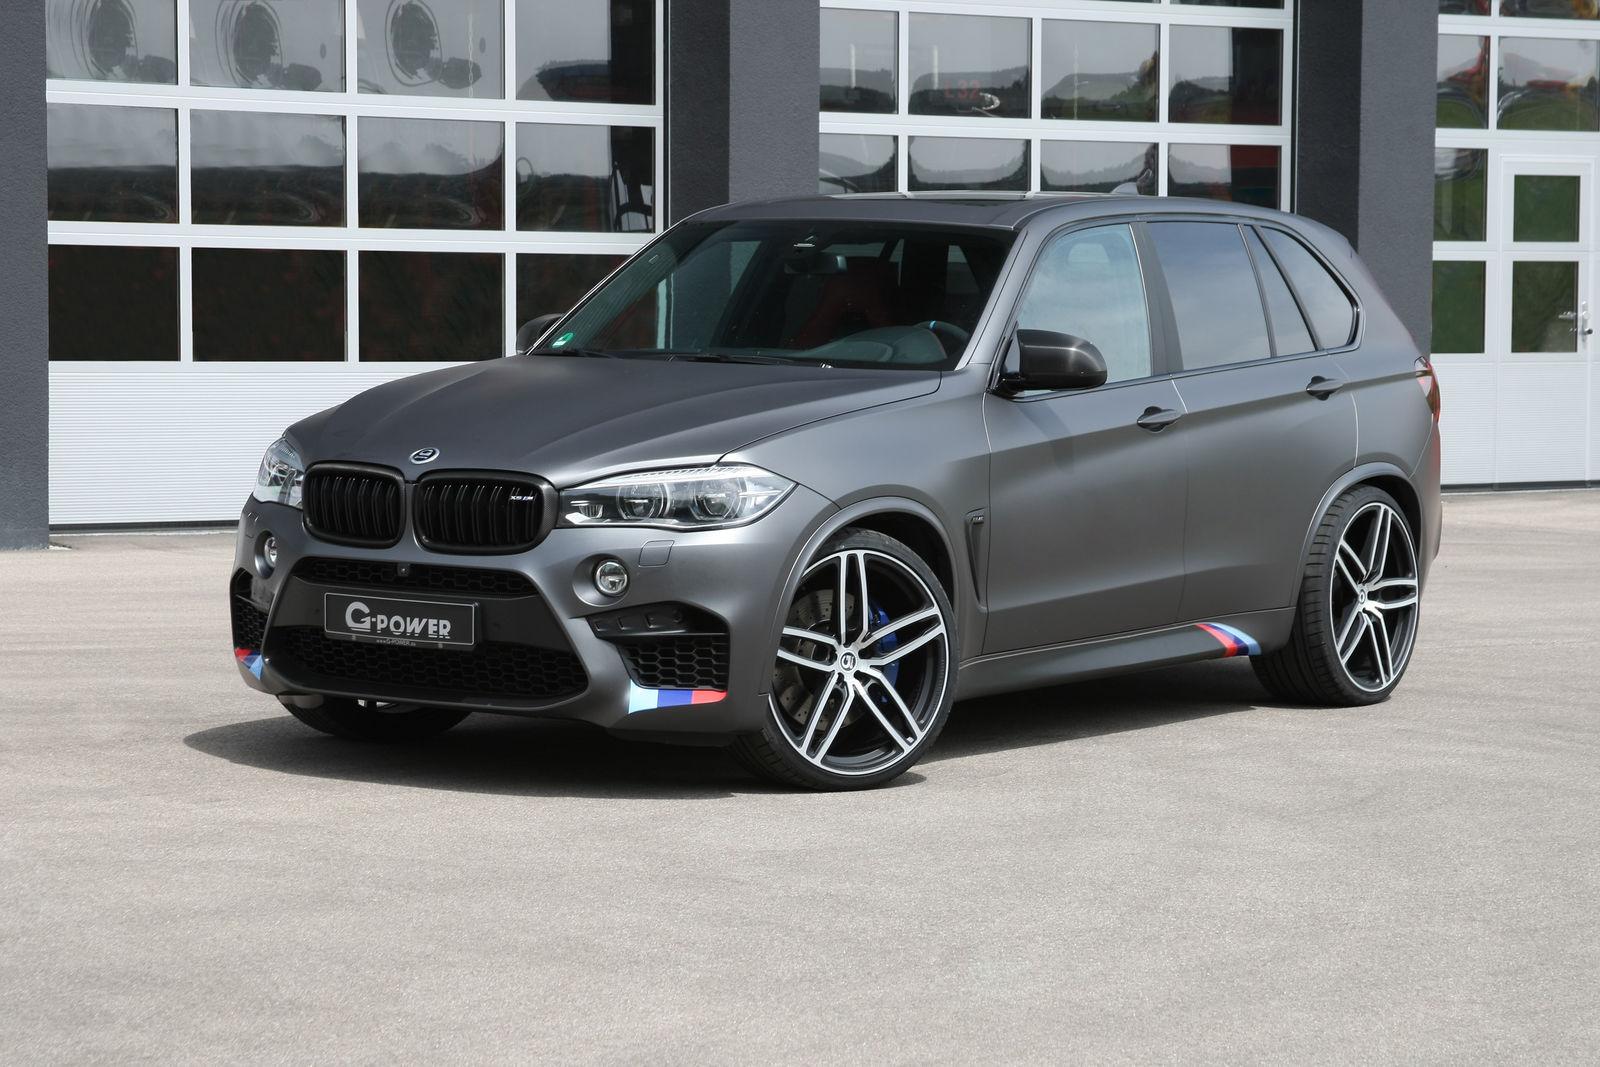 BMW Convertible bmw x5 m edition G-Power Unleashes BMW X5 M with 750hp - GTspirit